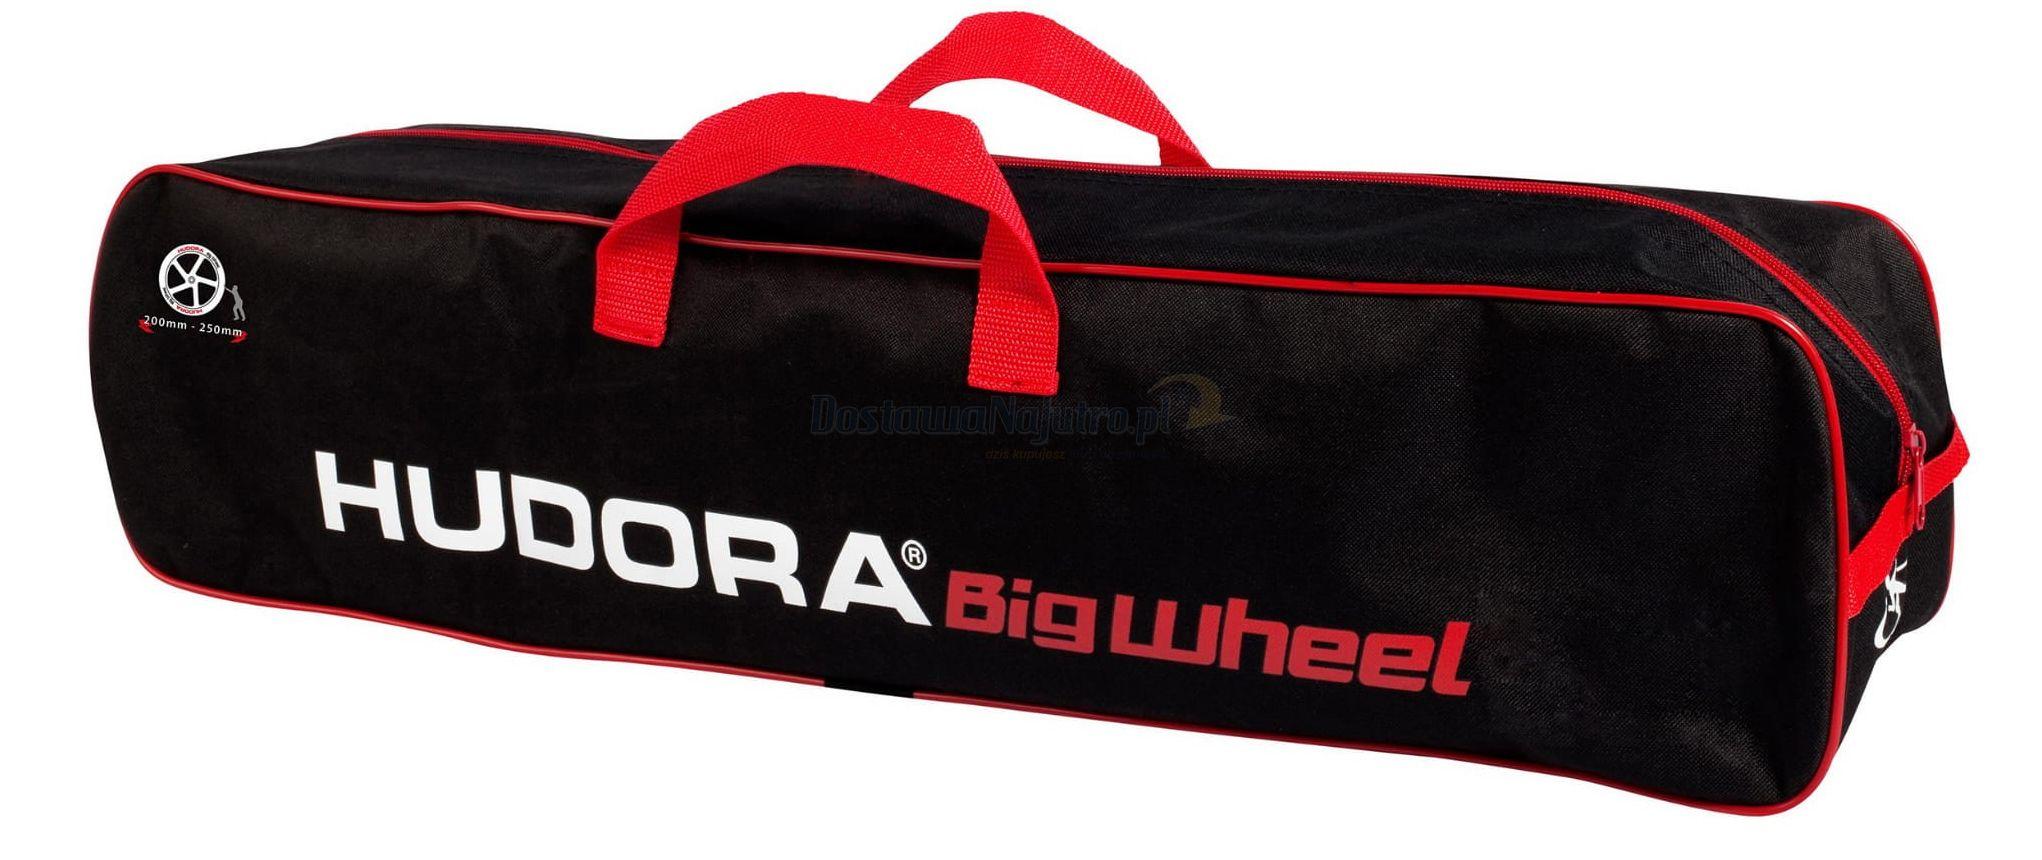 TORBA POKROWIEC na hulajnogę Big Wheel 200 - 250mm HUDORA